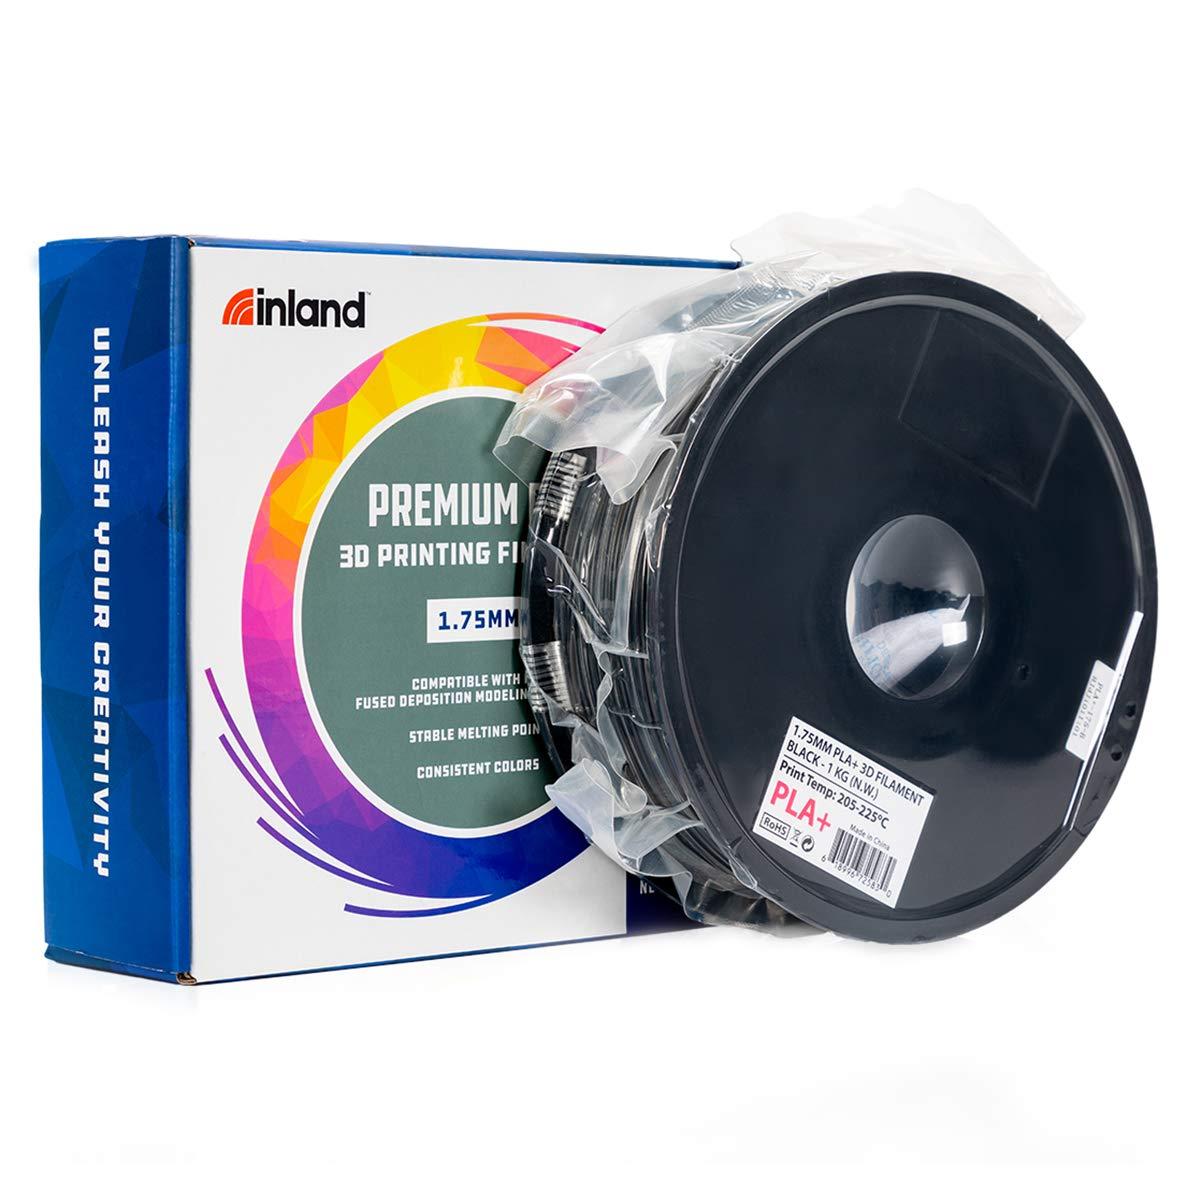 Inland Premium 175mm Pla 3d Printer Filament 1kg Stable Supply Spool 22 Lbs Industrial Scientific